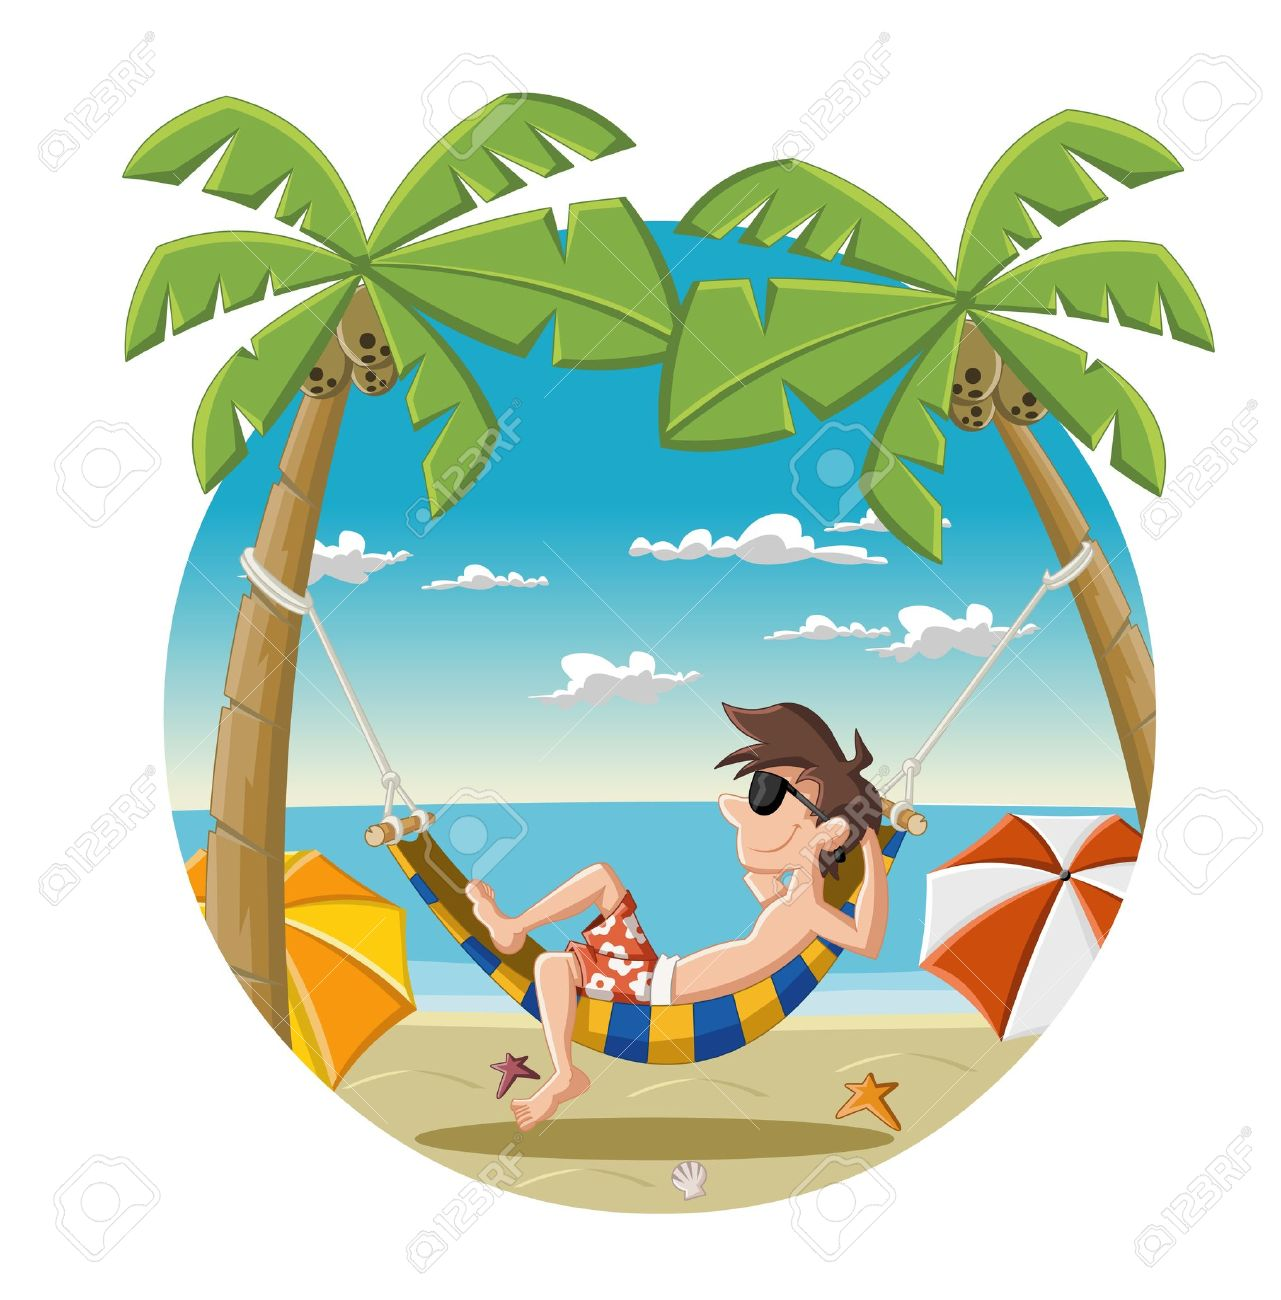 886 Hammock Beach Stock Vector Illustration And Royalty Free ...